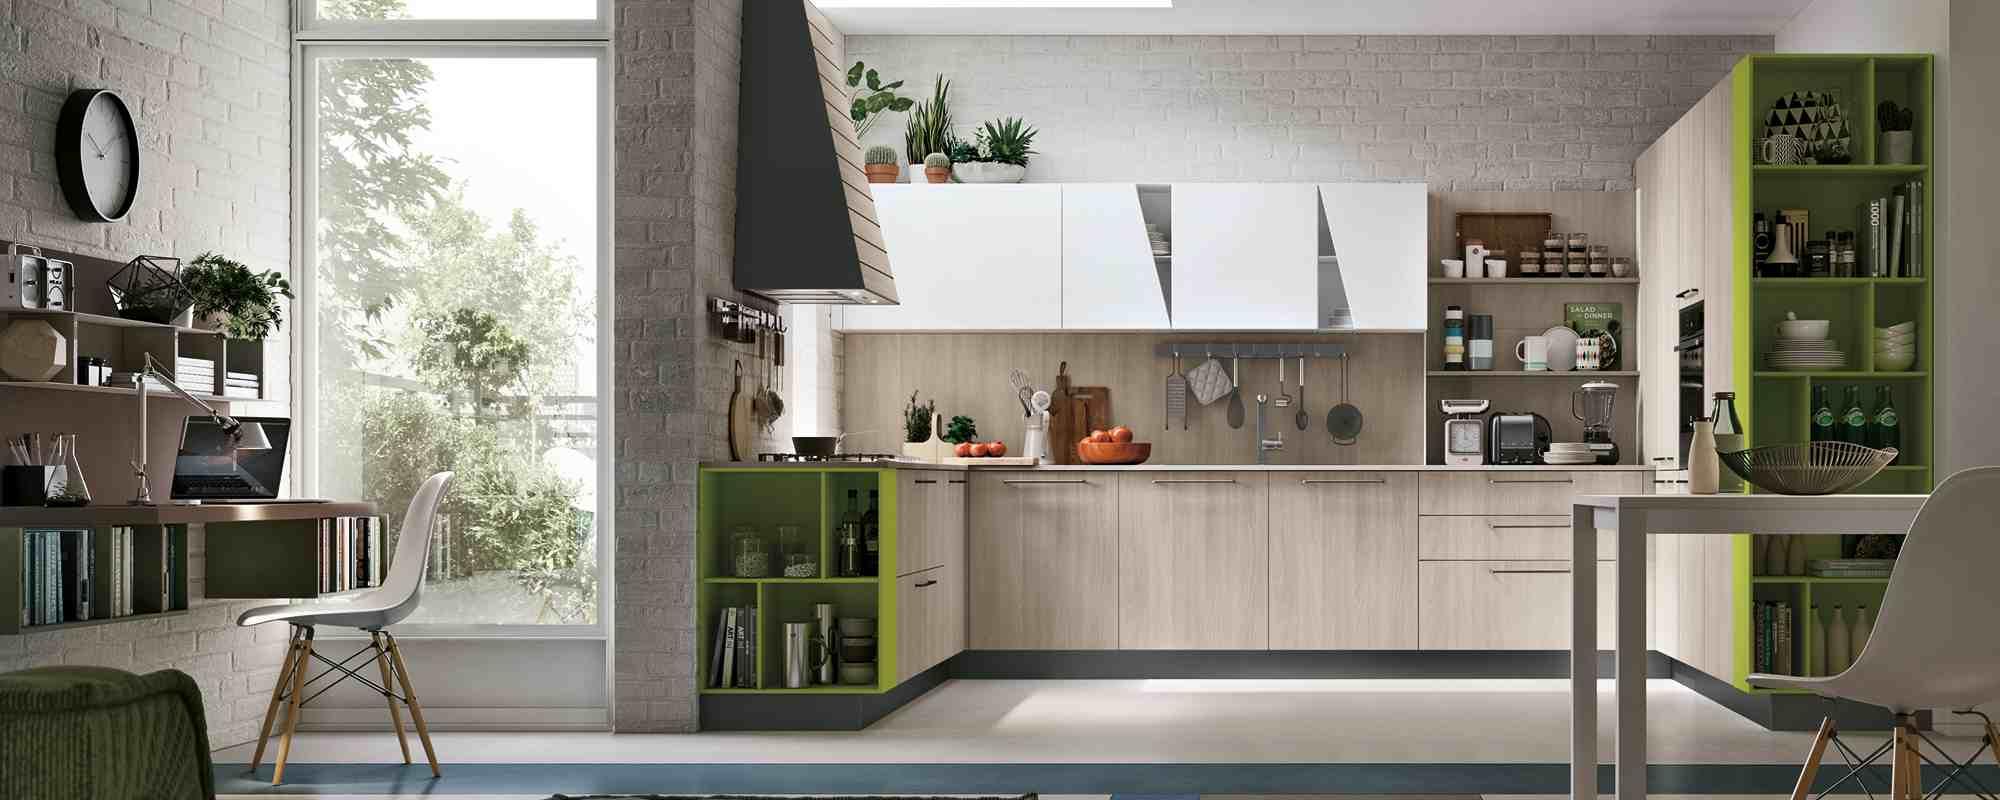 Cucine stosa 2018 - Mobili cucina genova ...